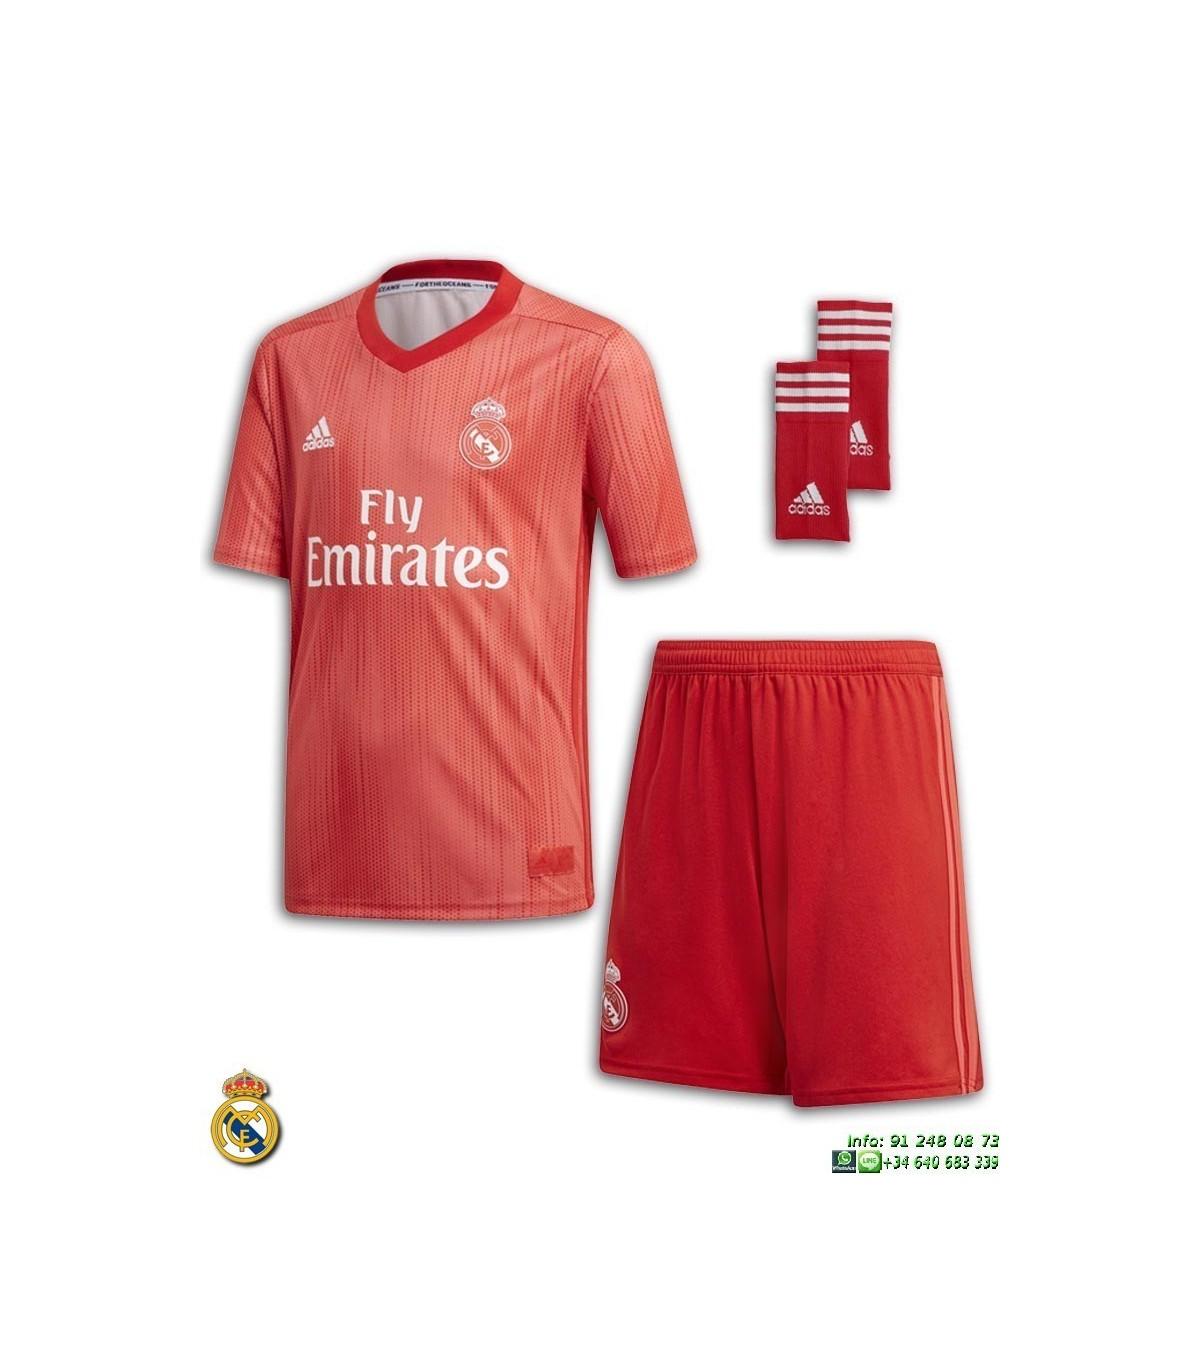 4948d142b ... Equipacion REAL MADRID 2018-2019 Rojo 3ª Camiseta Junior ADIDAS Oficial  · Equipacion ...